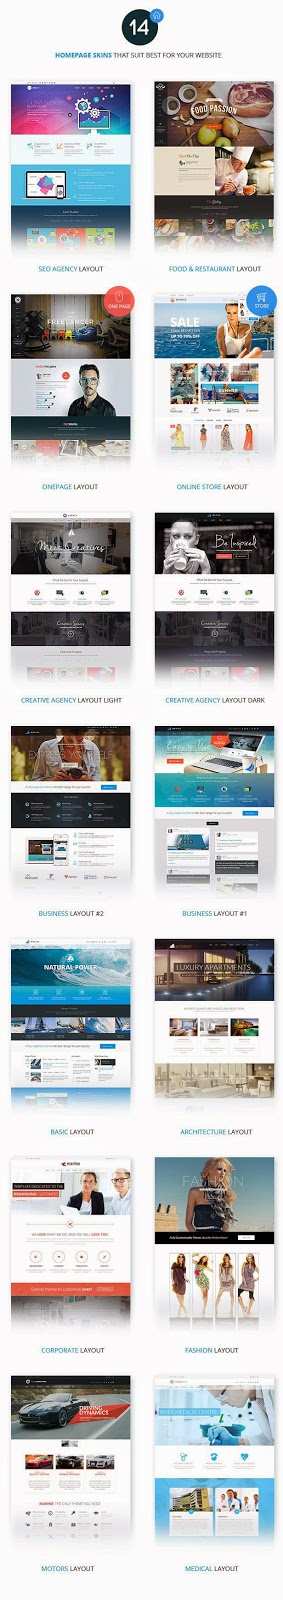 Multipurpose Bootstrap HTML5 Template 2015